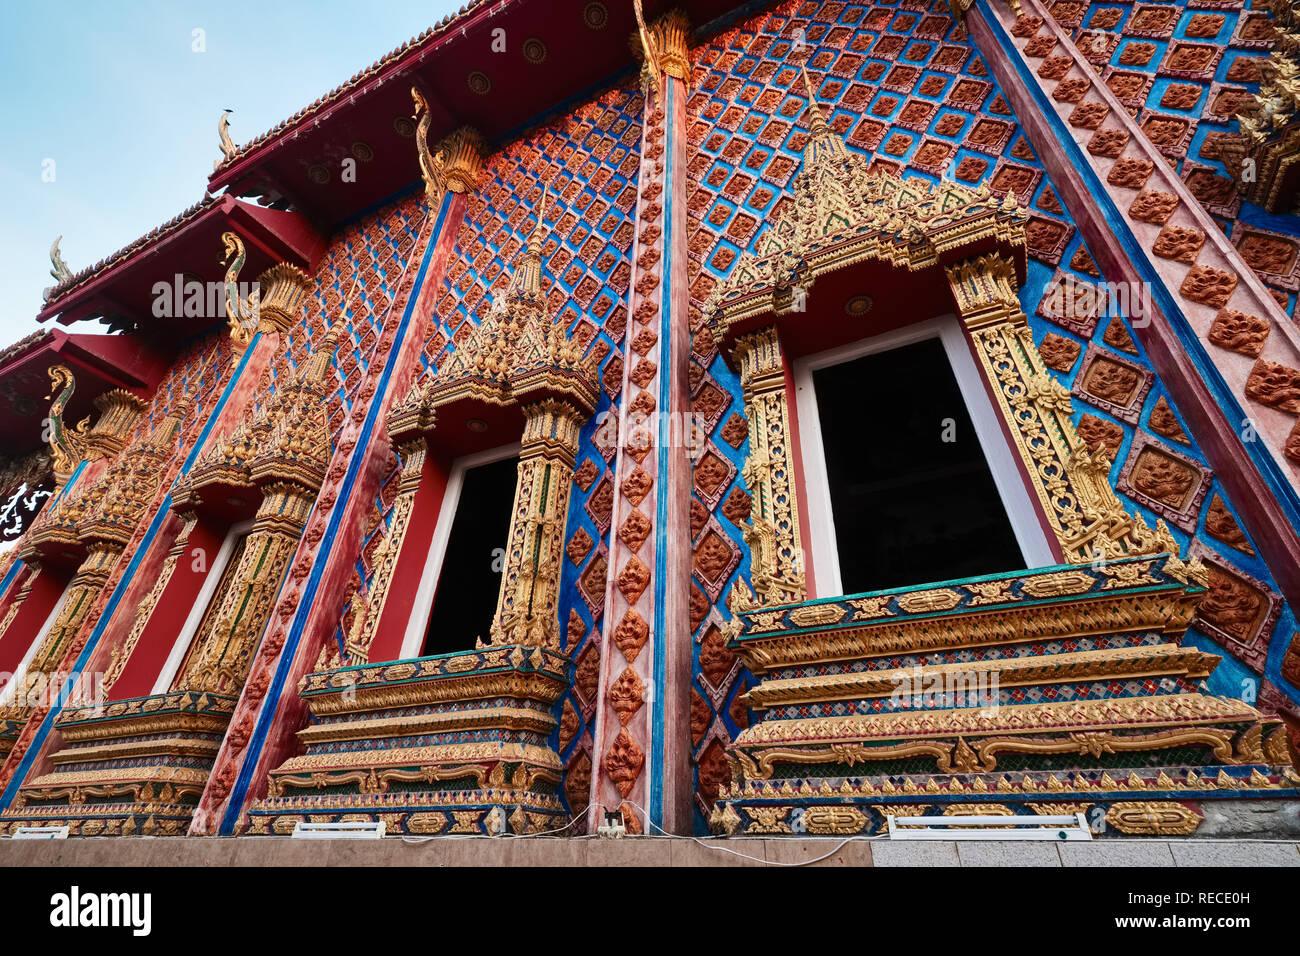 L'elaborato finestre e decorazioni a parete di Wat Phra Nang Sang, Thalang, Phuket, Tailandia Foto Stock